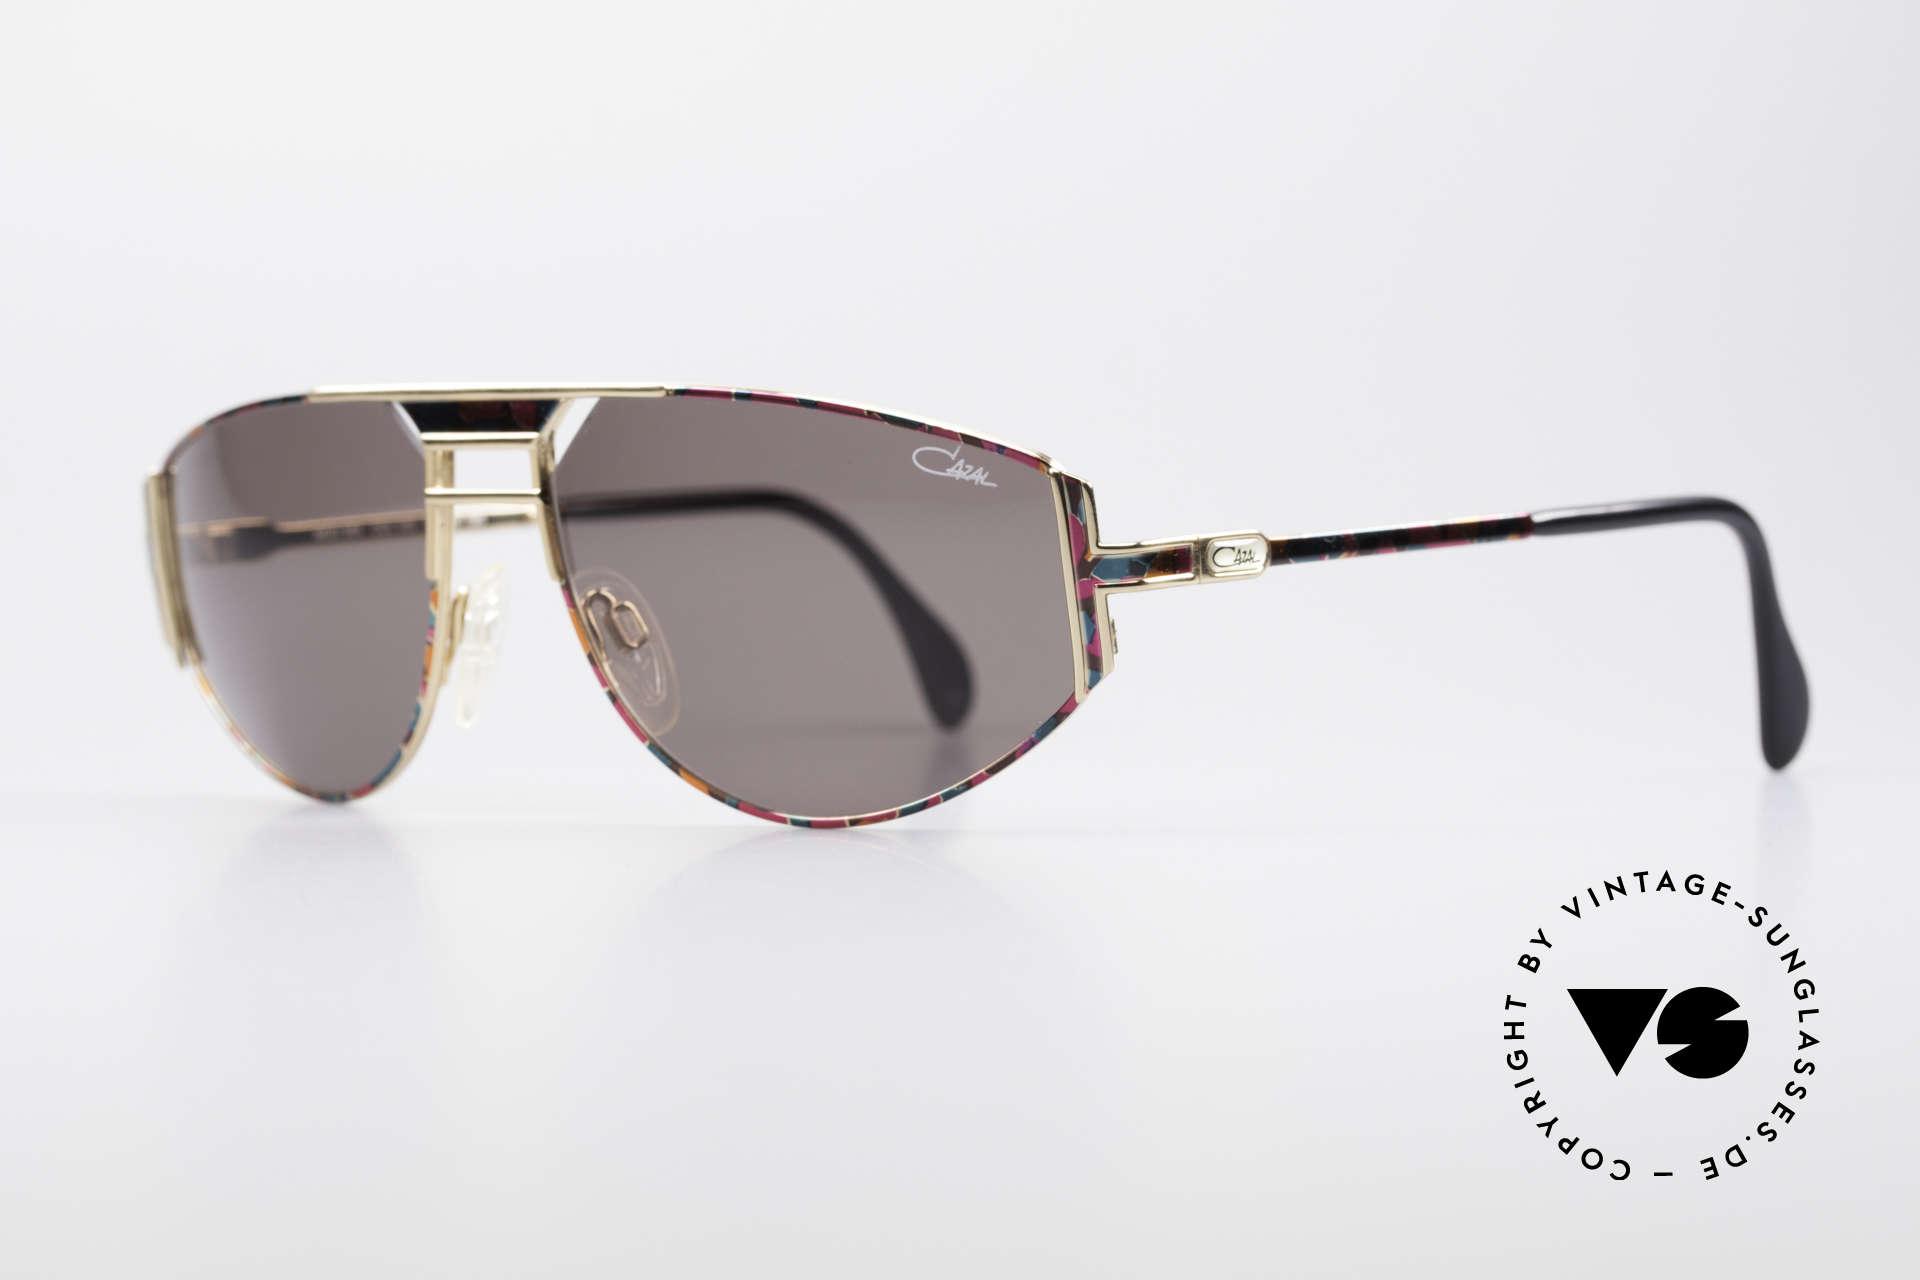 Cazal 964 True 90's No Retro Sunglasses, terrific creation by famous CAri ZALloni (Mr. CAZAL), Made for Men and Women